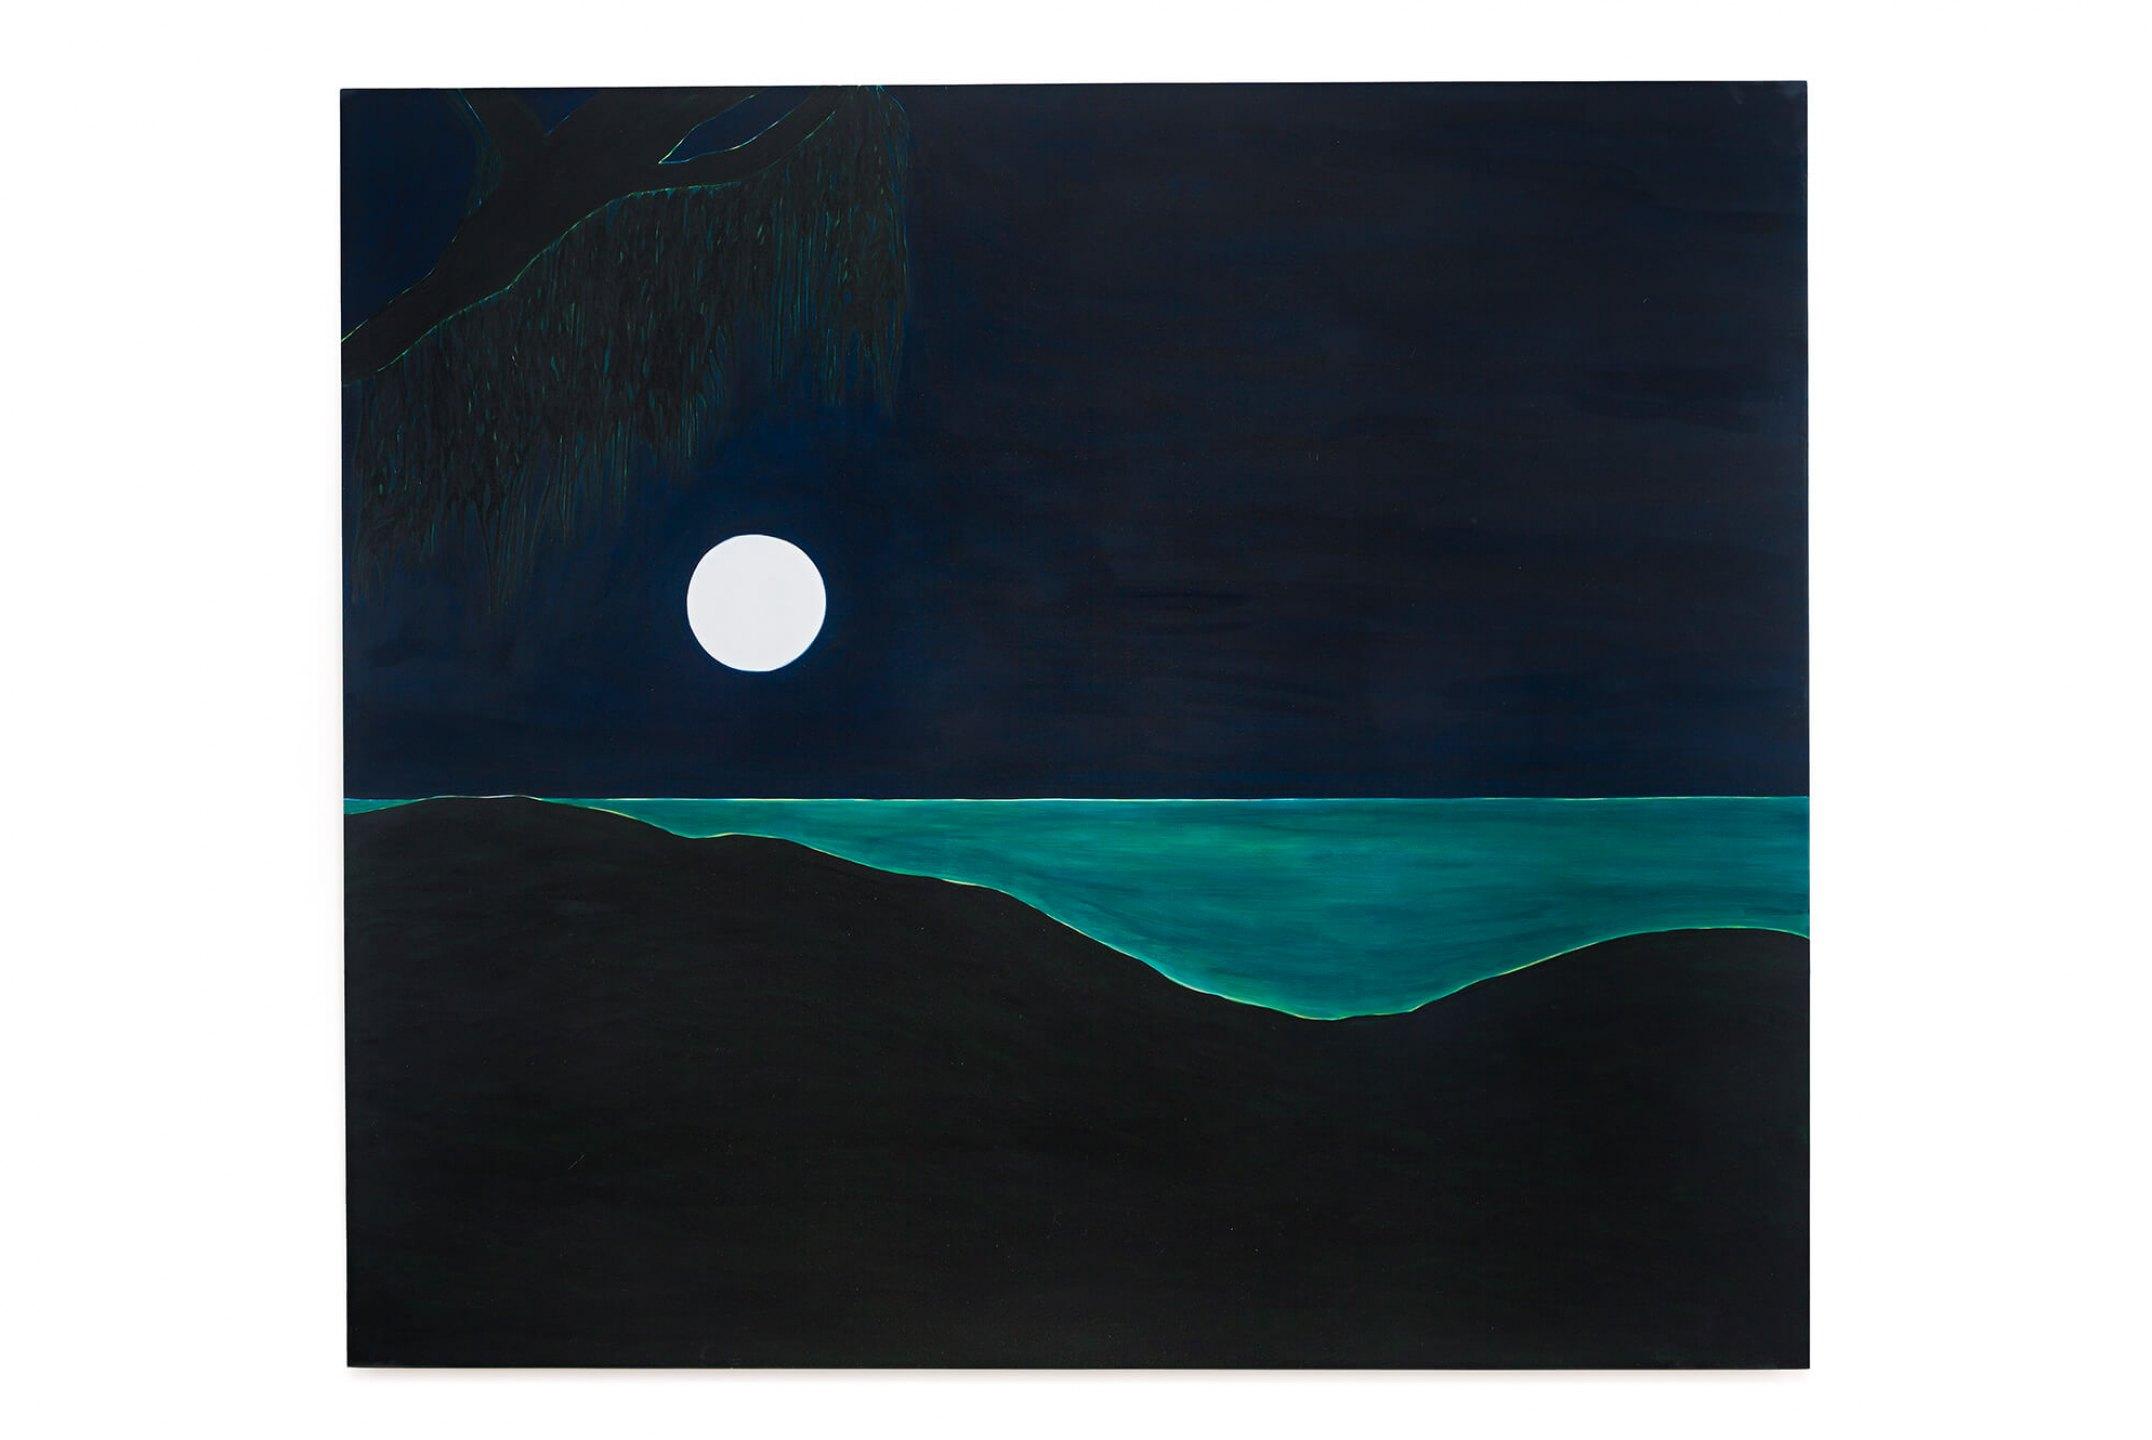 Patricia Leite, <em>De longe,</em> 2015, oil on wood, 40×50 cm - Mendes Wood DM